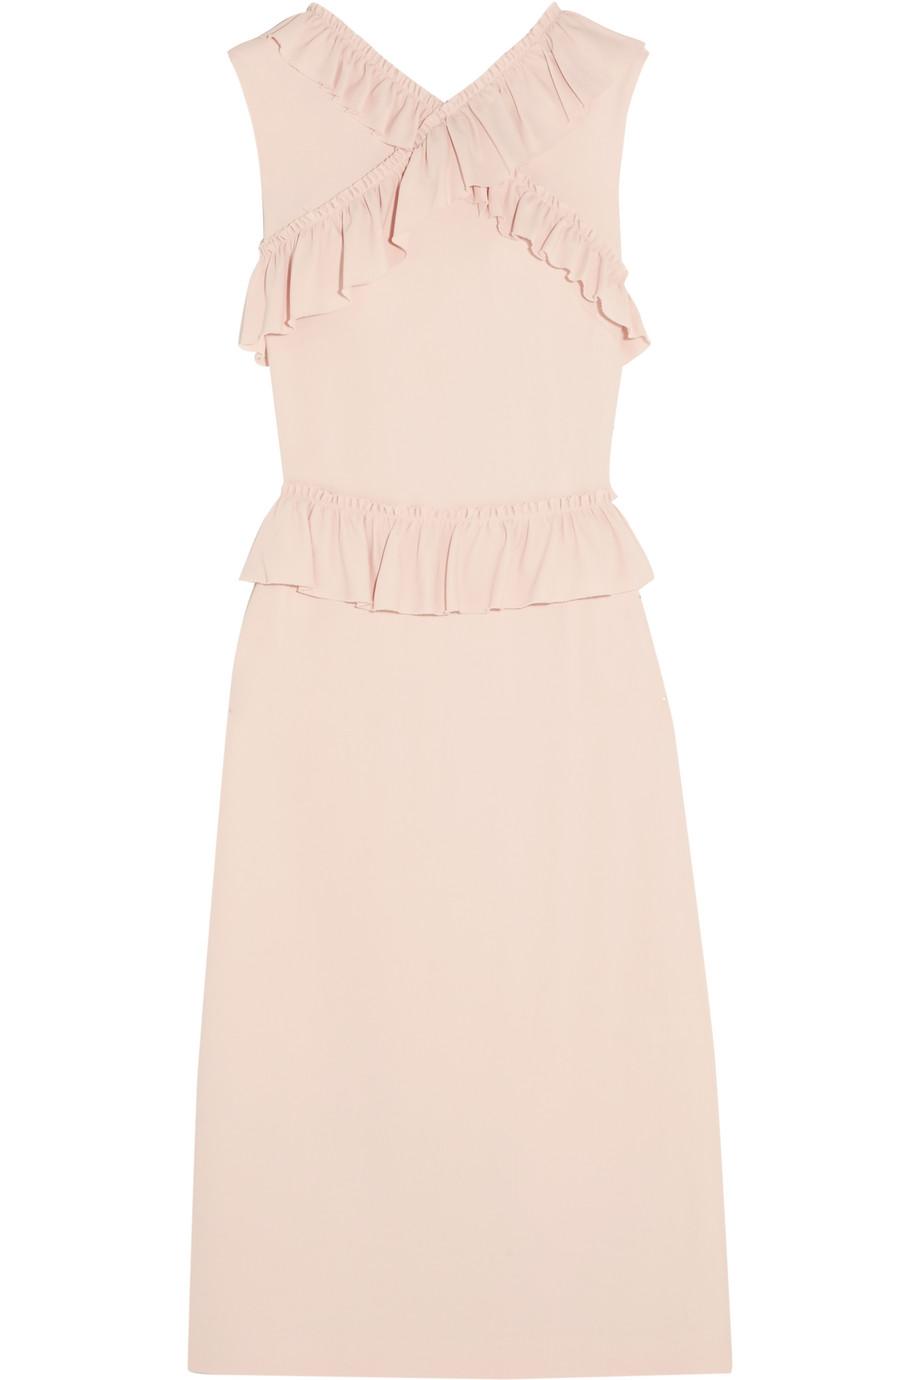 Simone Rocha Ruffle-Trimmed Stretch-Crepe Dress, Blush, Women's, Size: 6